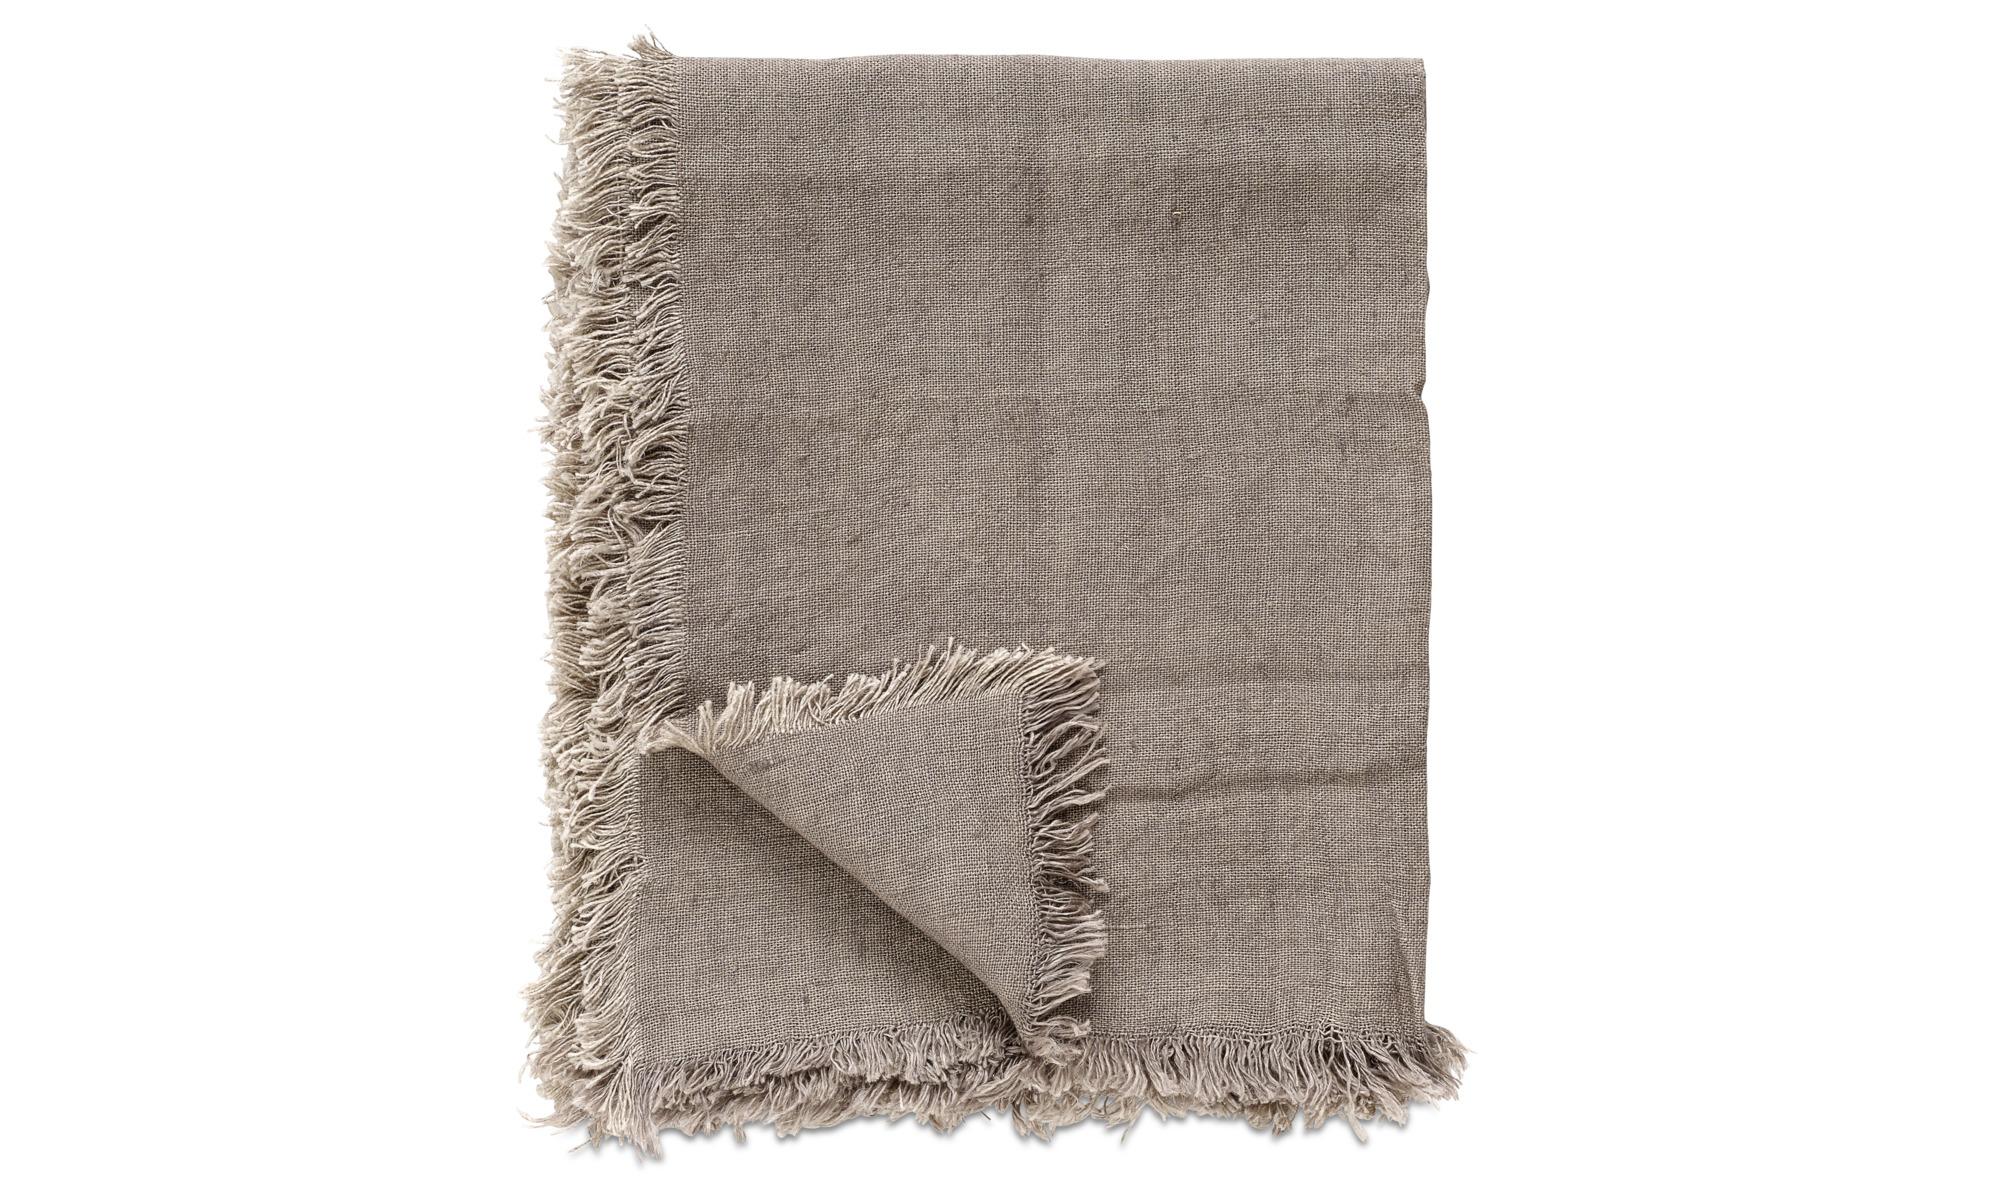 Narzuty - Pled Linen - Brązowy - Tkanina